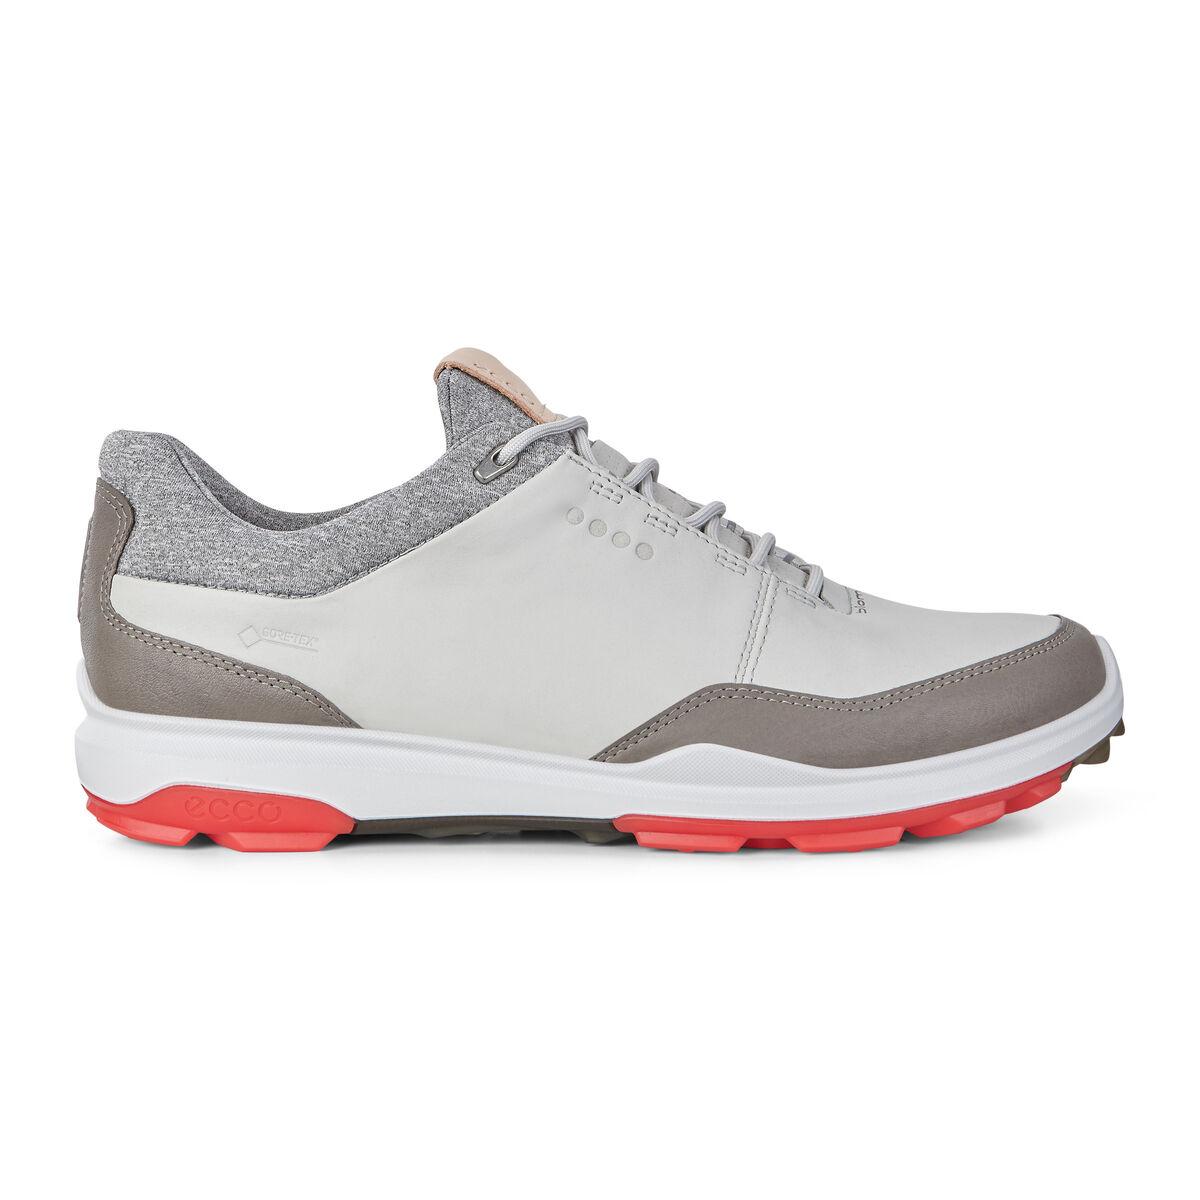 ef64b774 BIOM Hybrid 3 GTX Men's Golf Shoe - Grey/Red